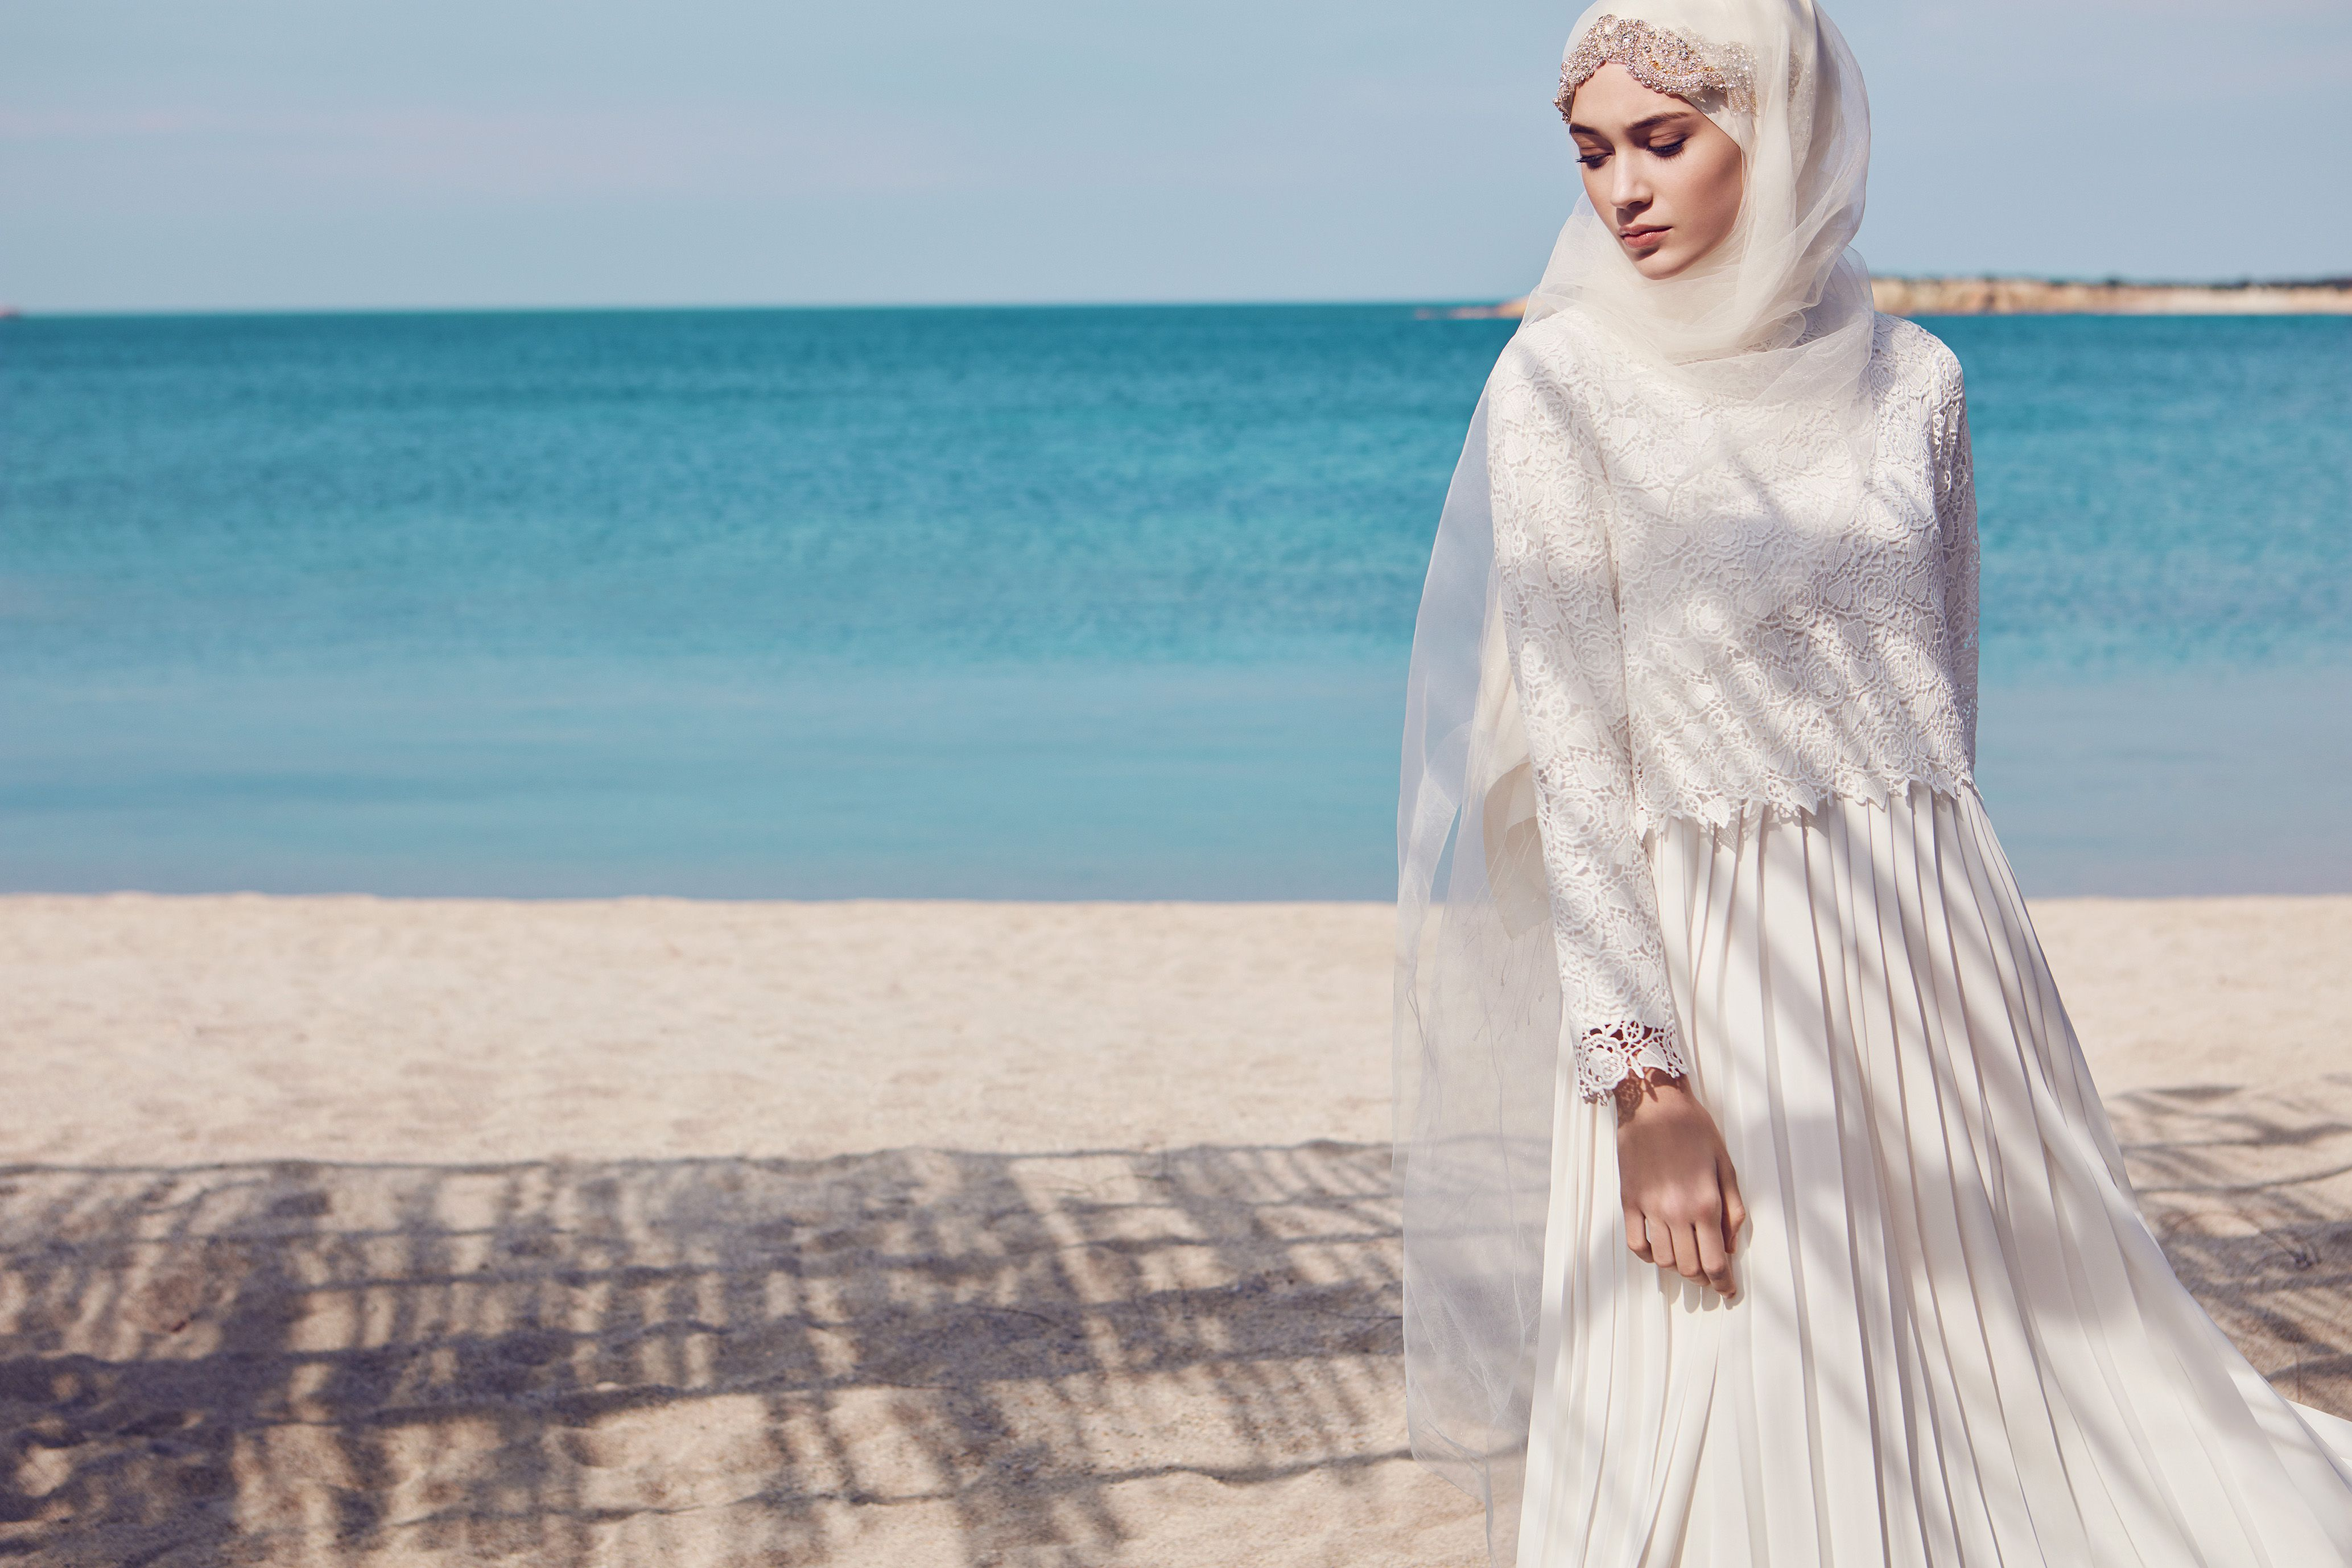 Pin by Betül on Dikiş - Abiye | Pinterest | Muslim, Wedding dress ...